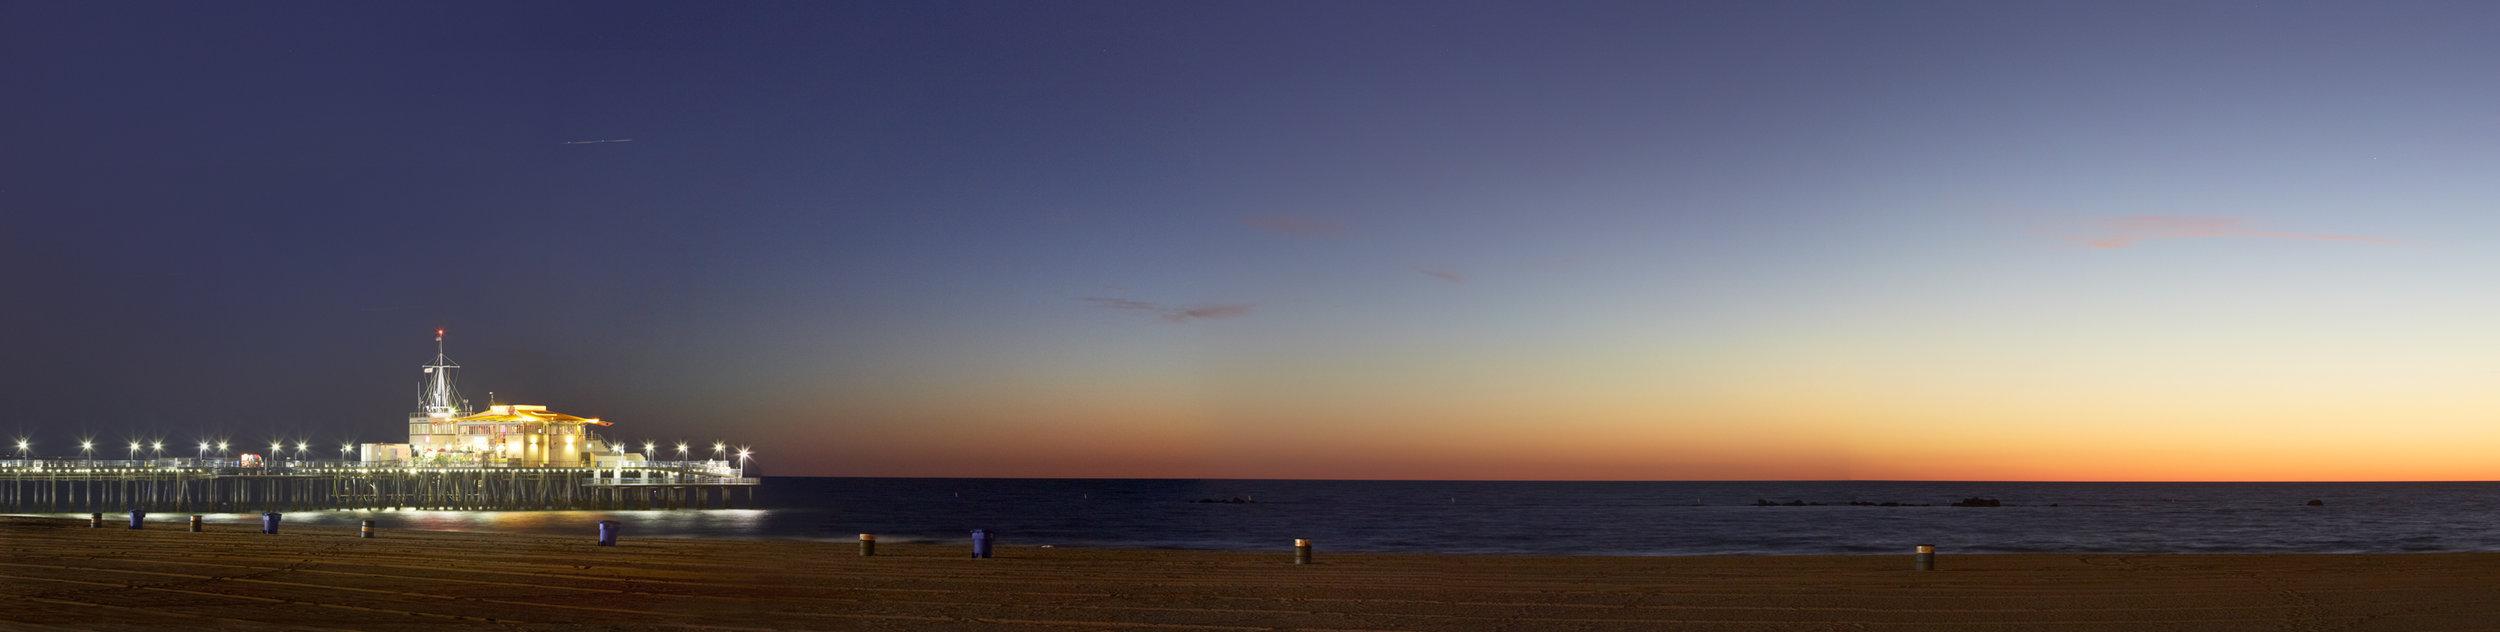 red beach with pier.jpg